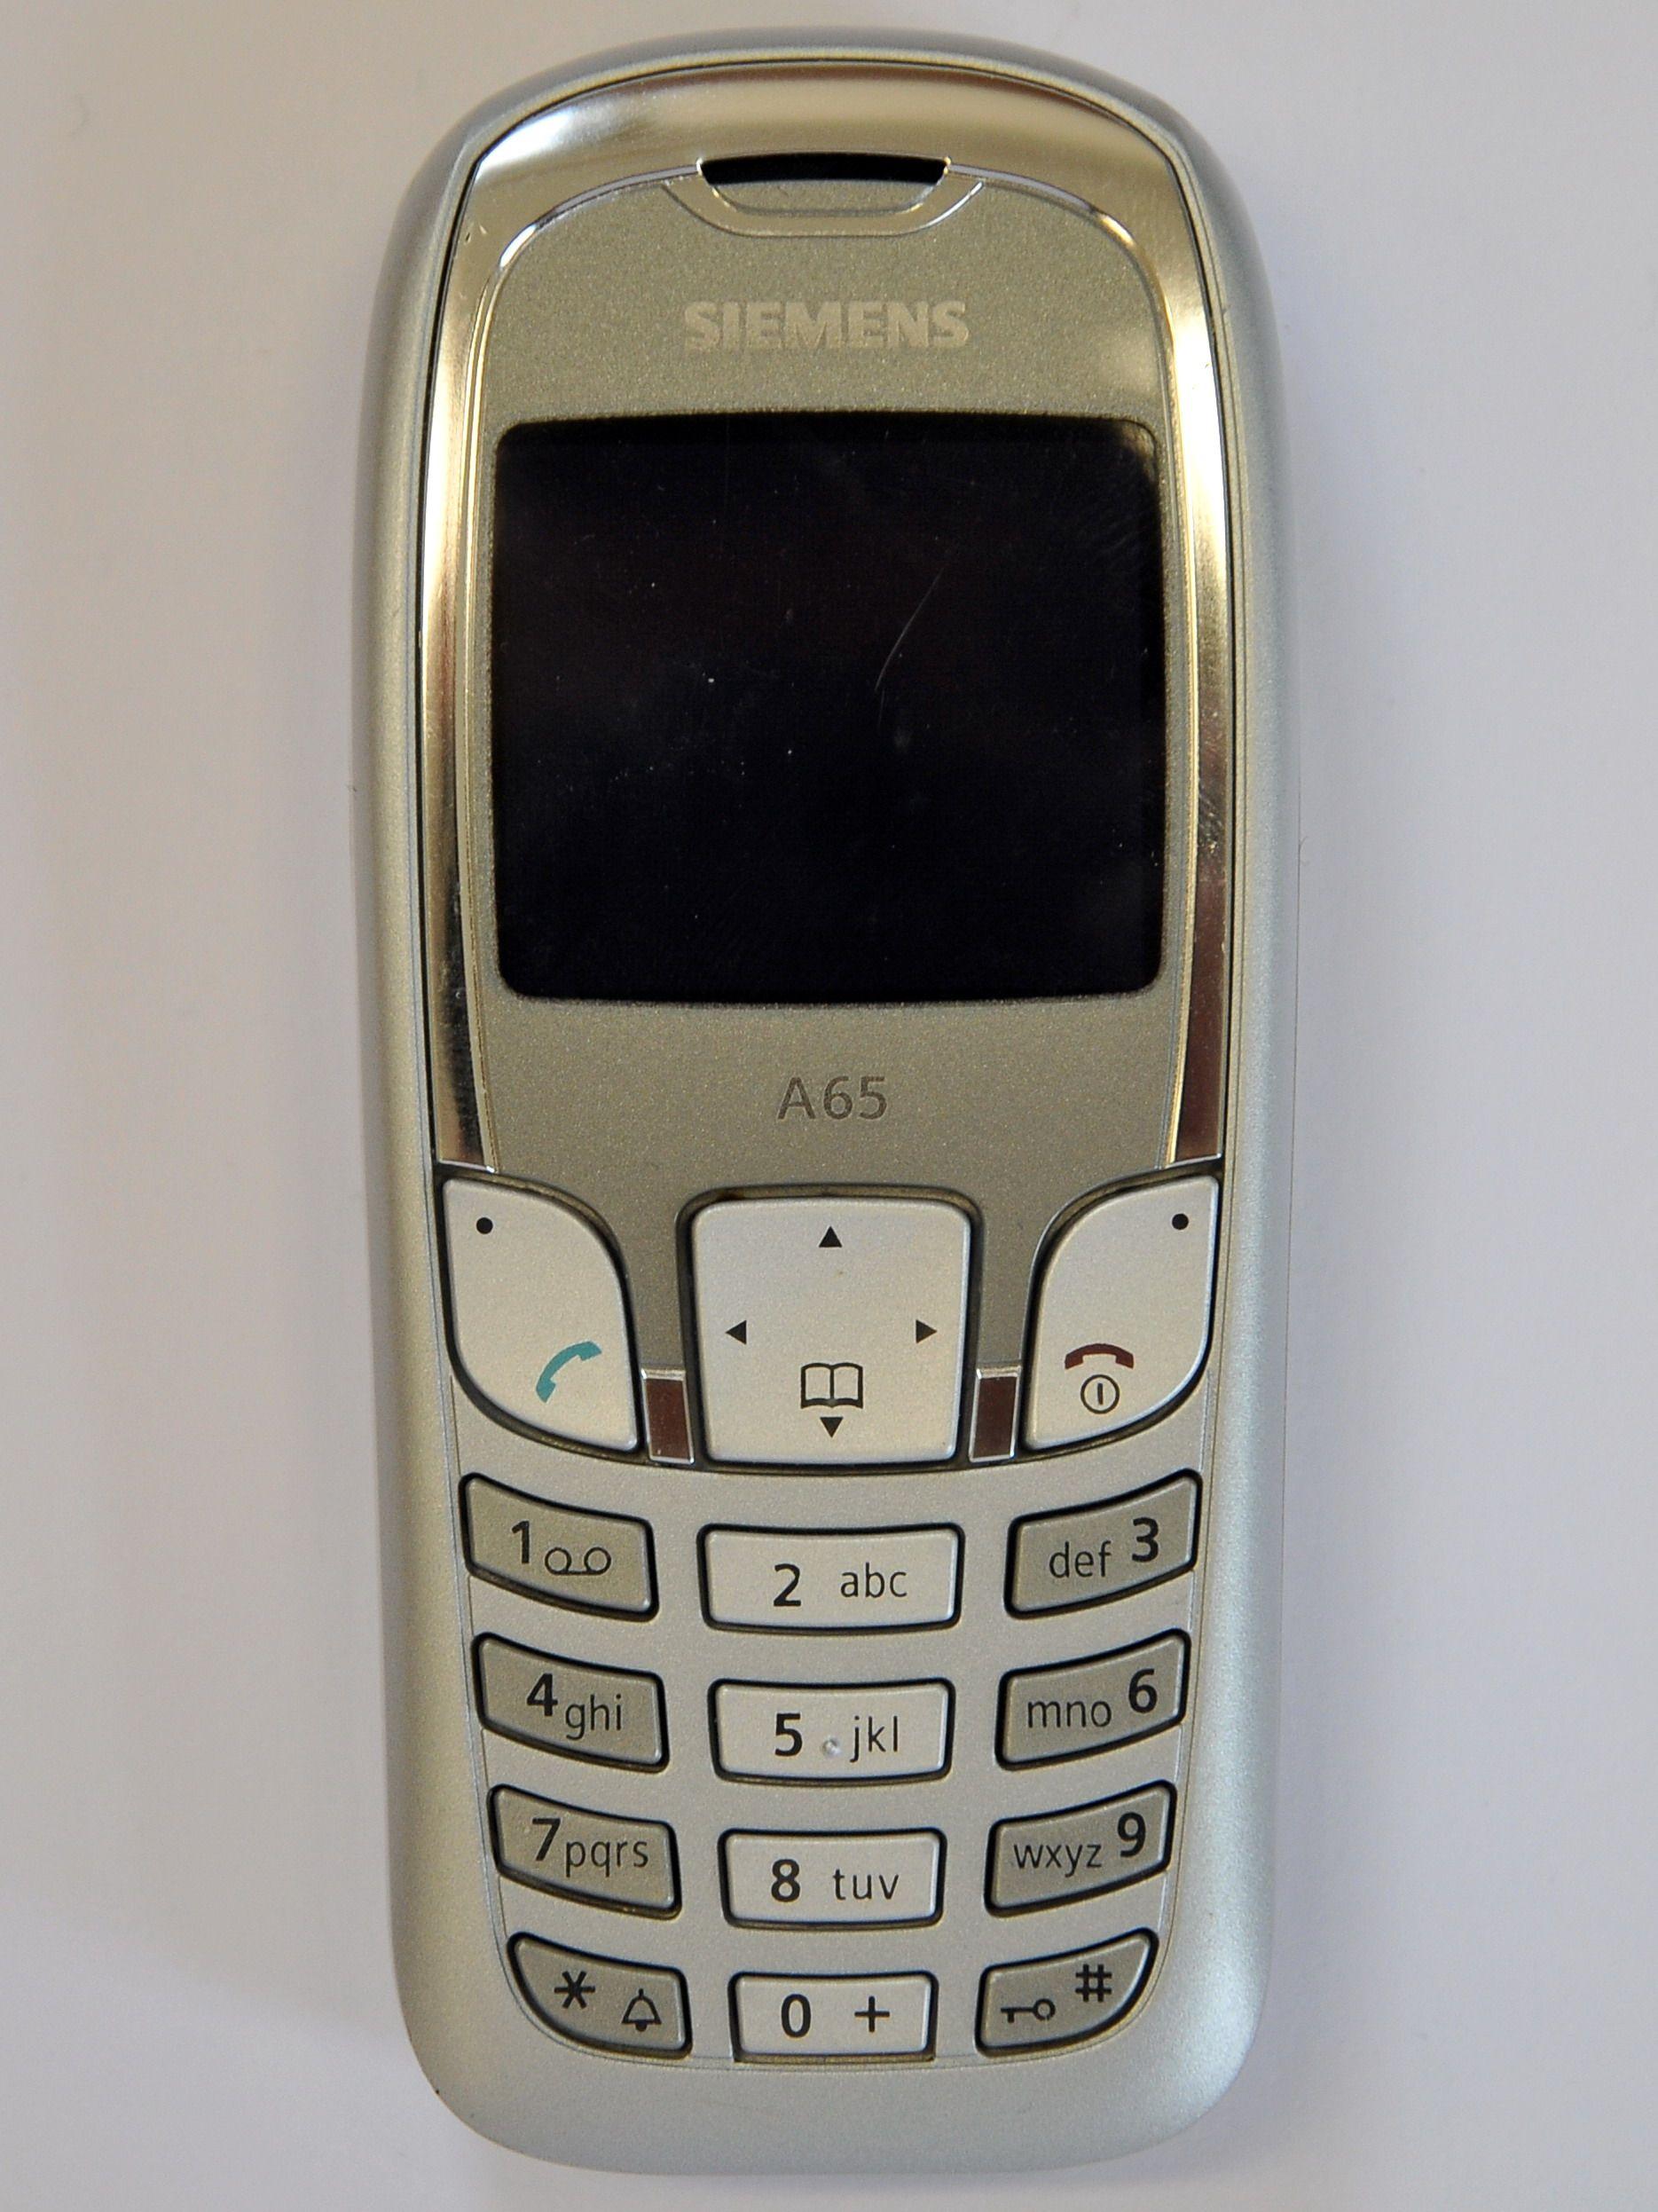 siemens a65 google search old phone pinterest rh pinterest com